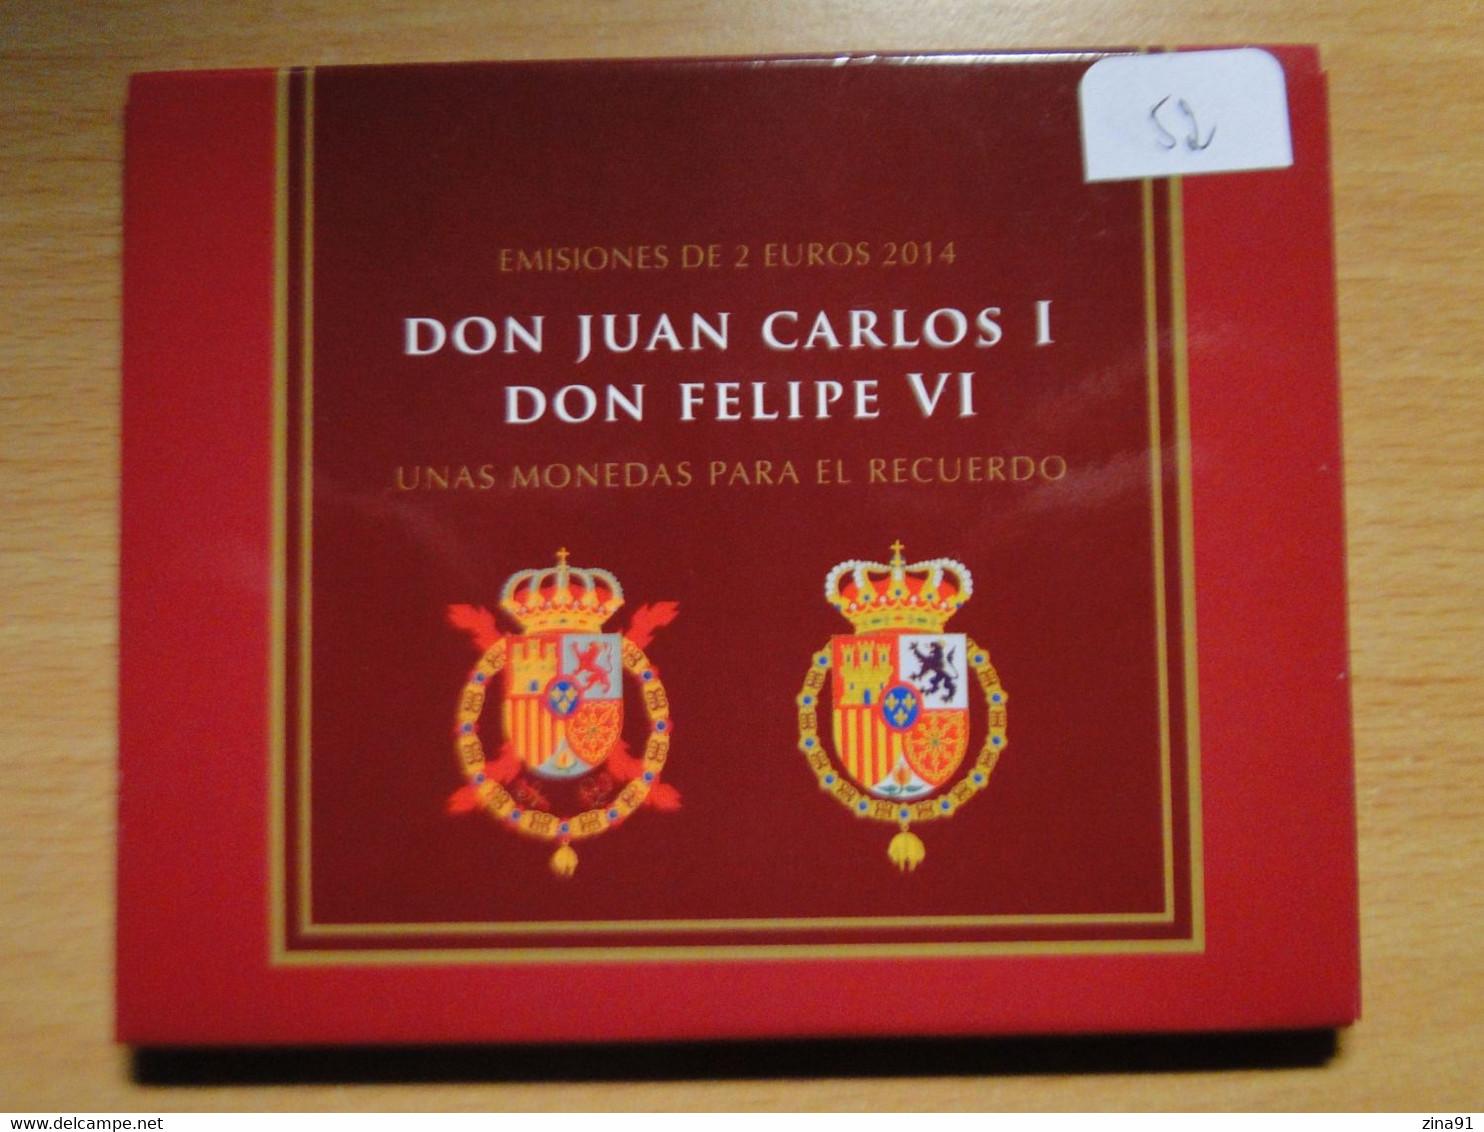 Espagne - Coffret 2 Euro Juan Carlos I Et Felipe VI 2014 Madrid - Espagne